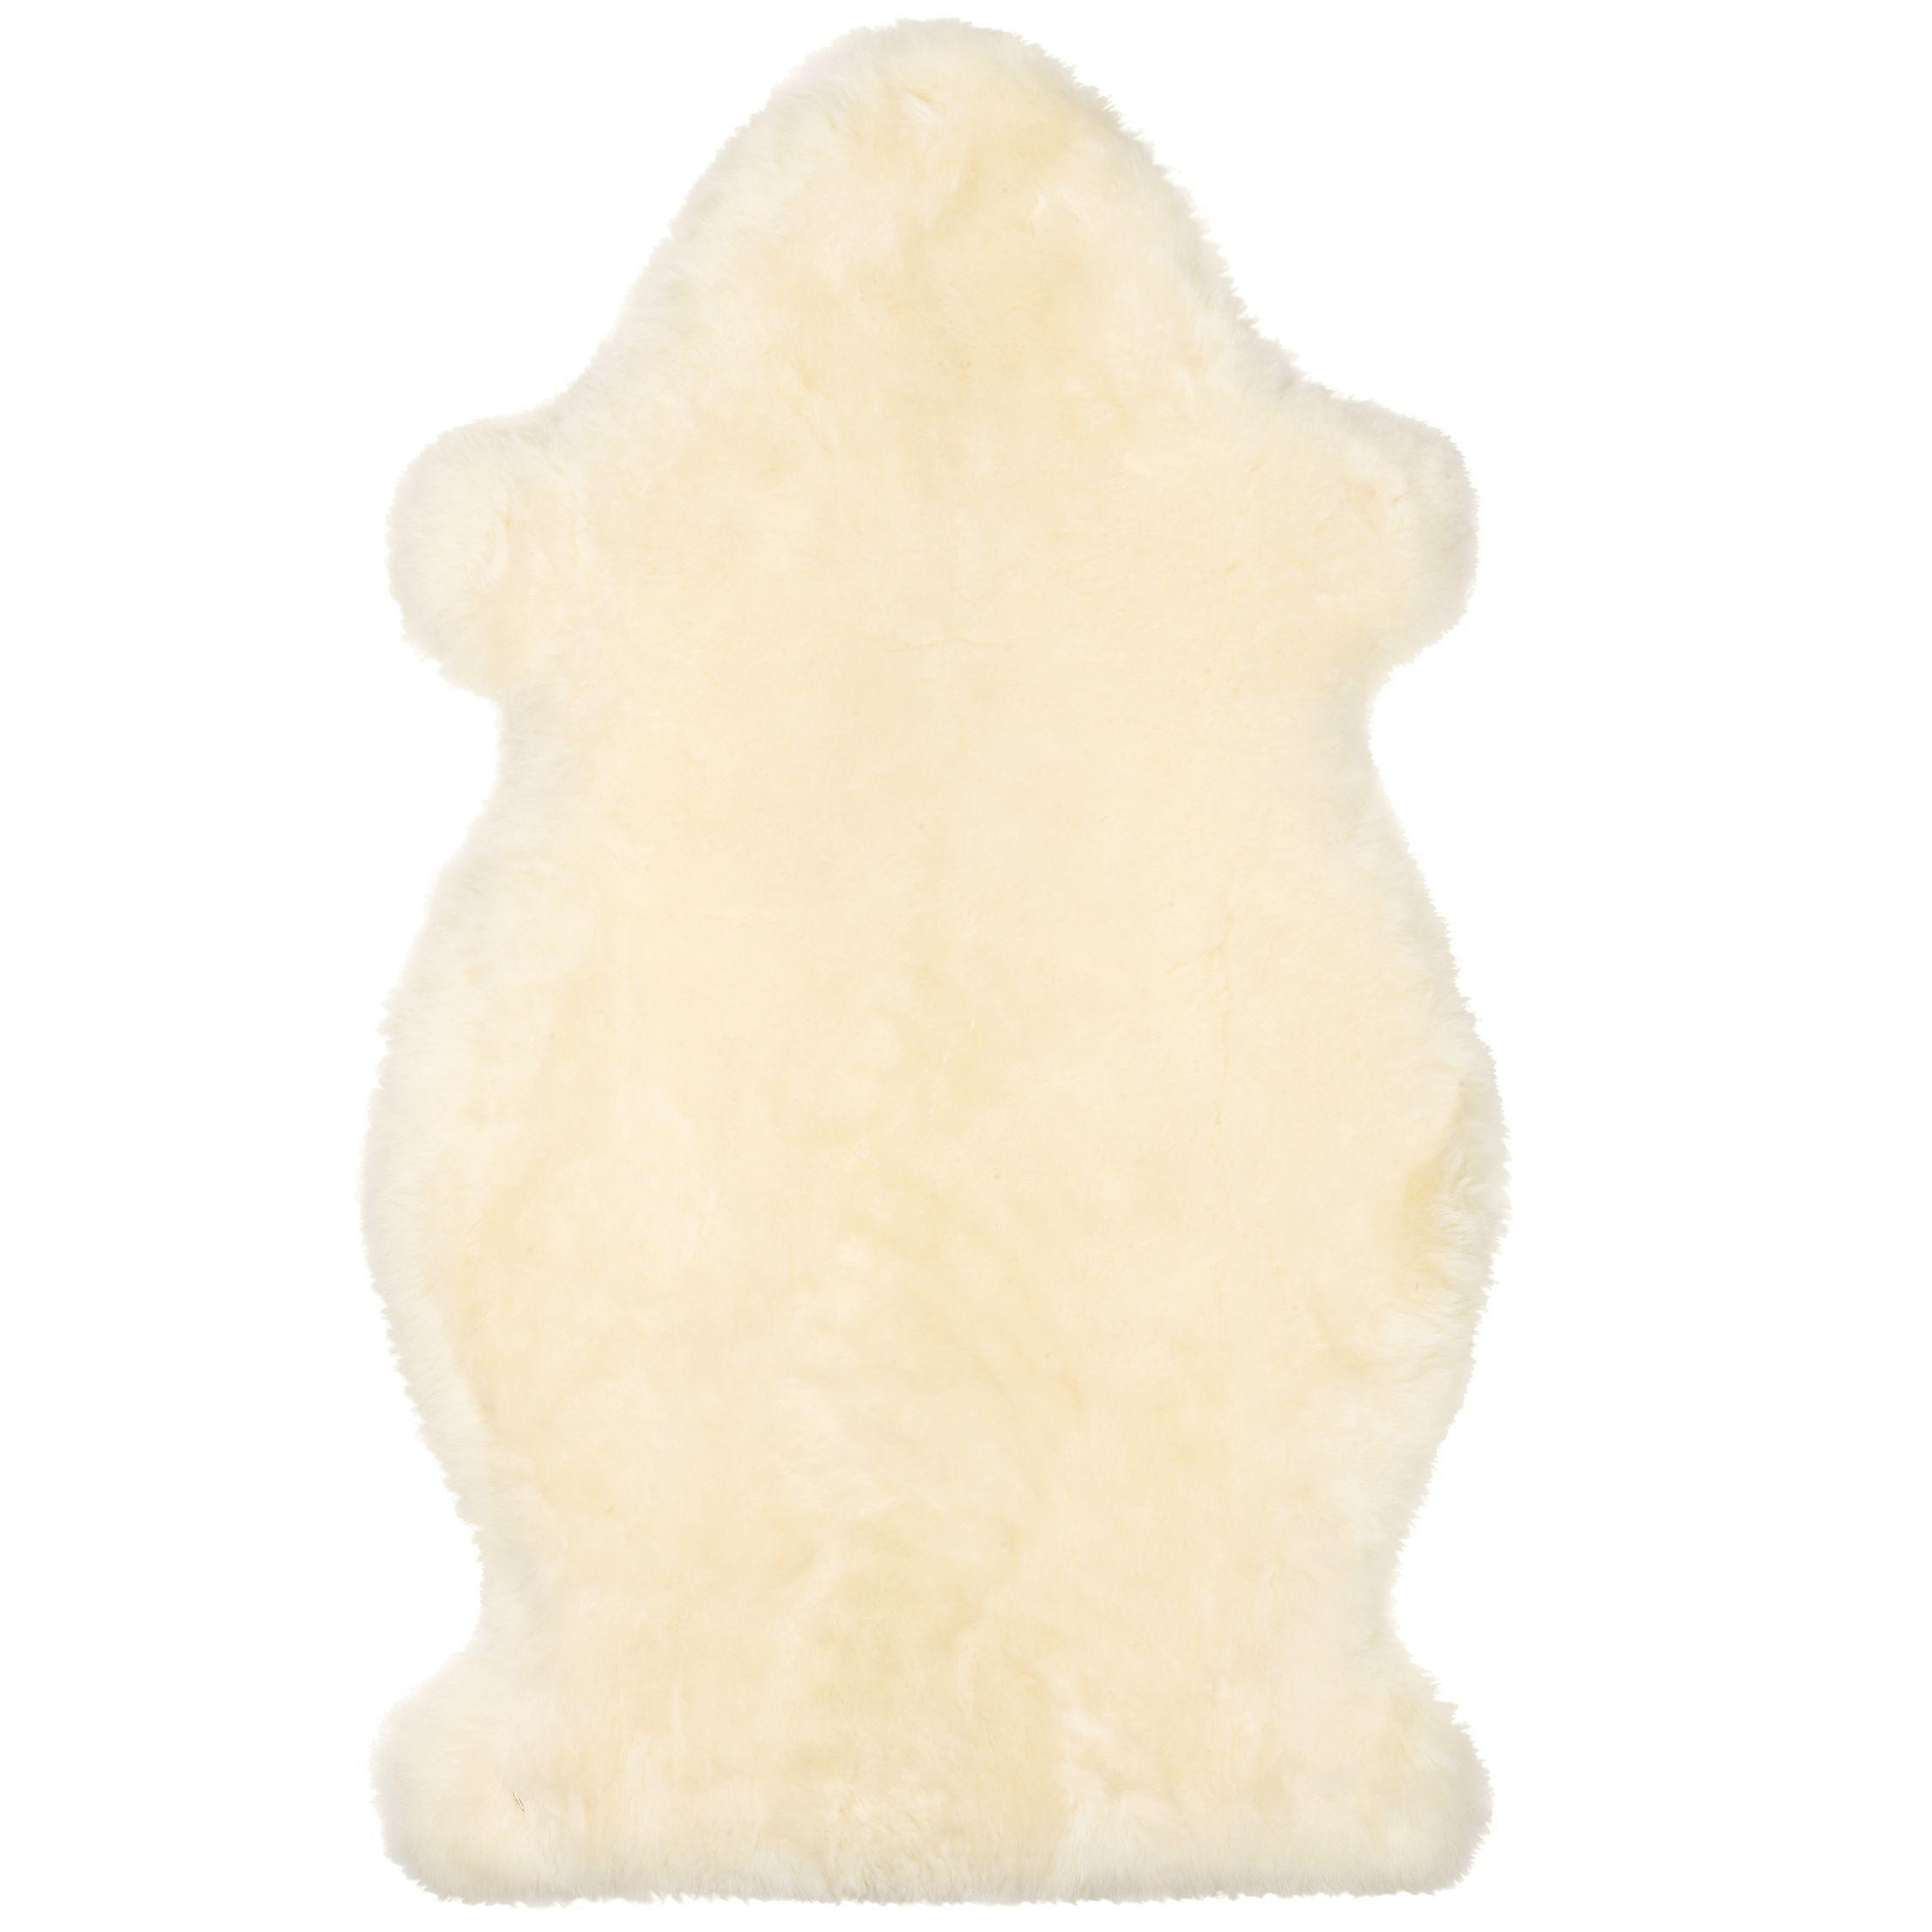 John Lewis Partners Sheepskin Baby Comforter Ivory In 2020